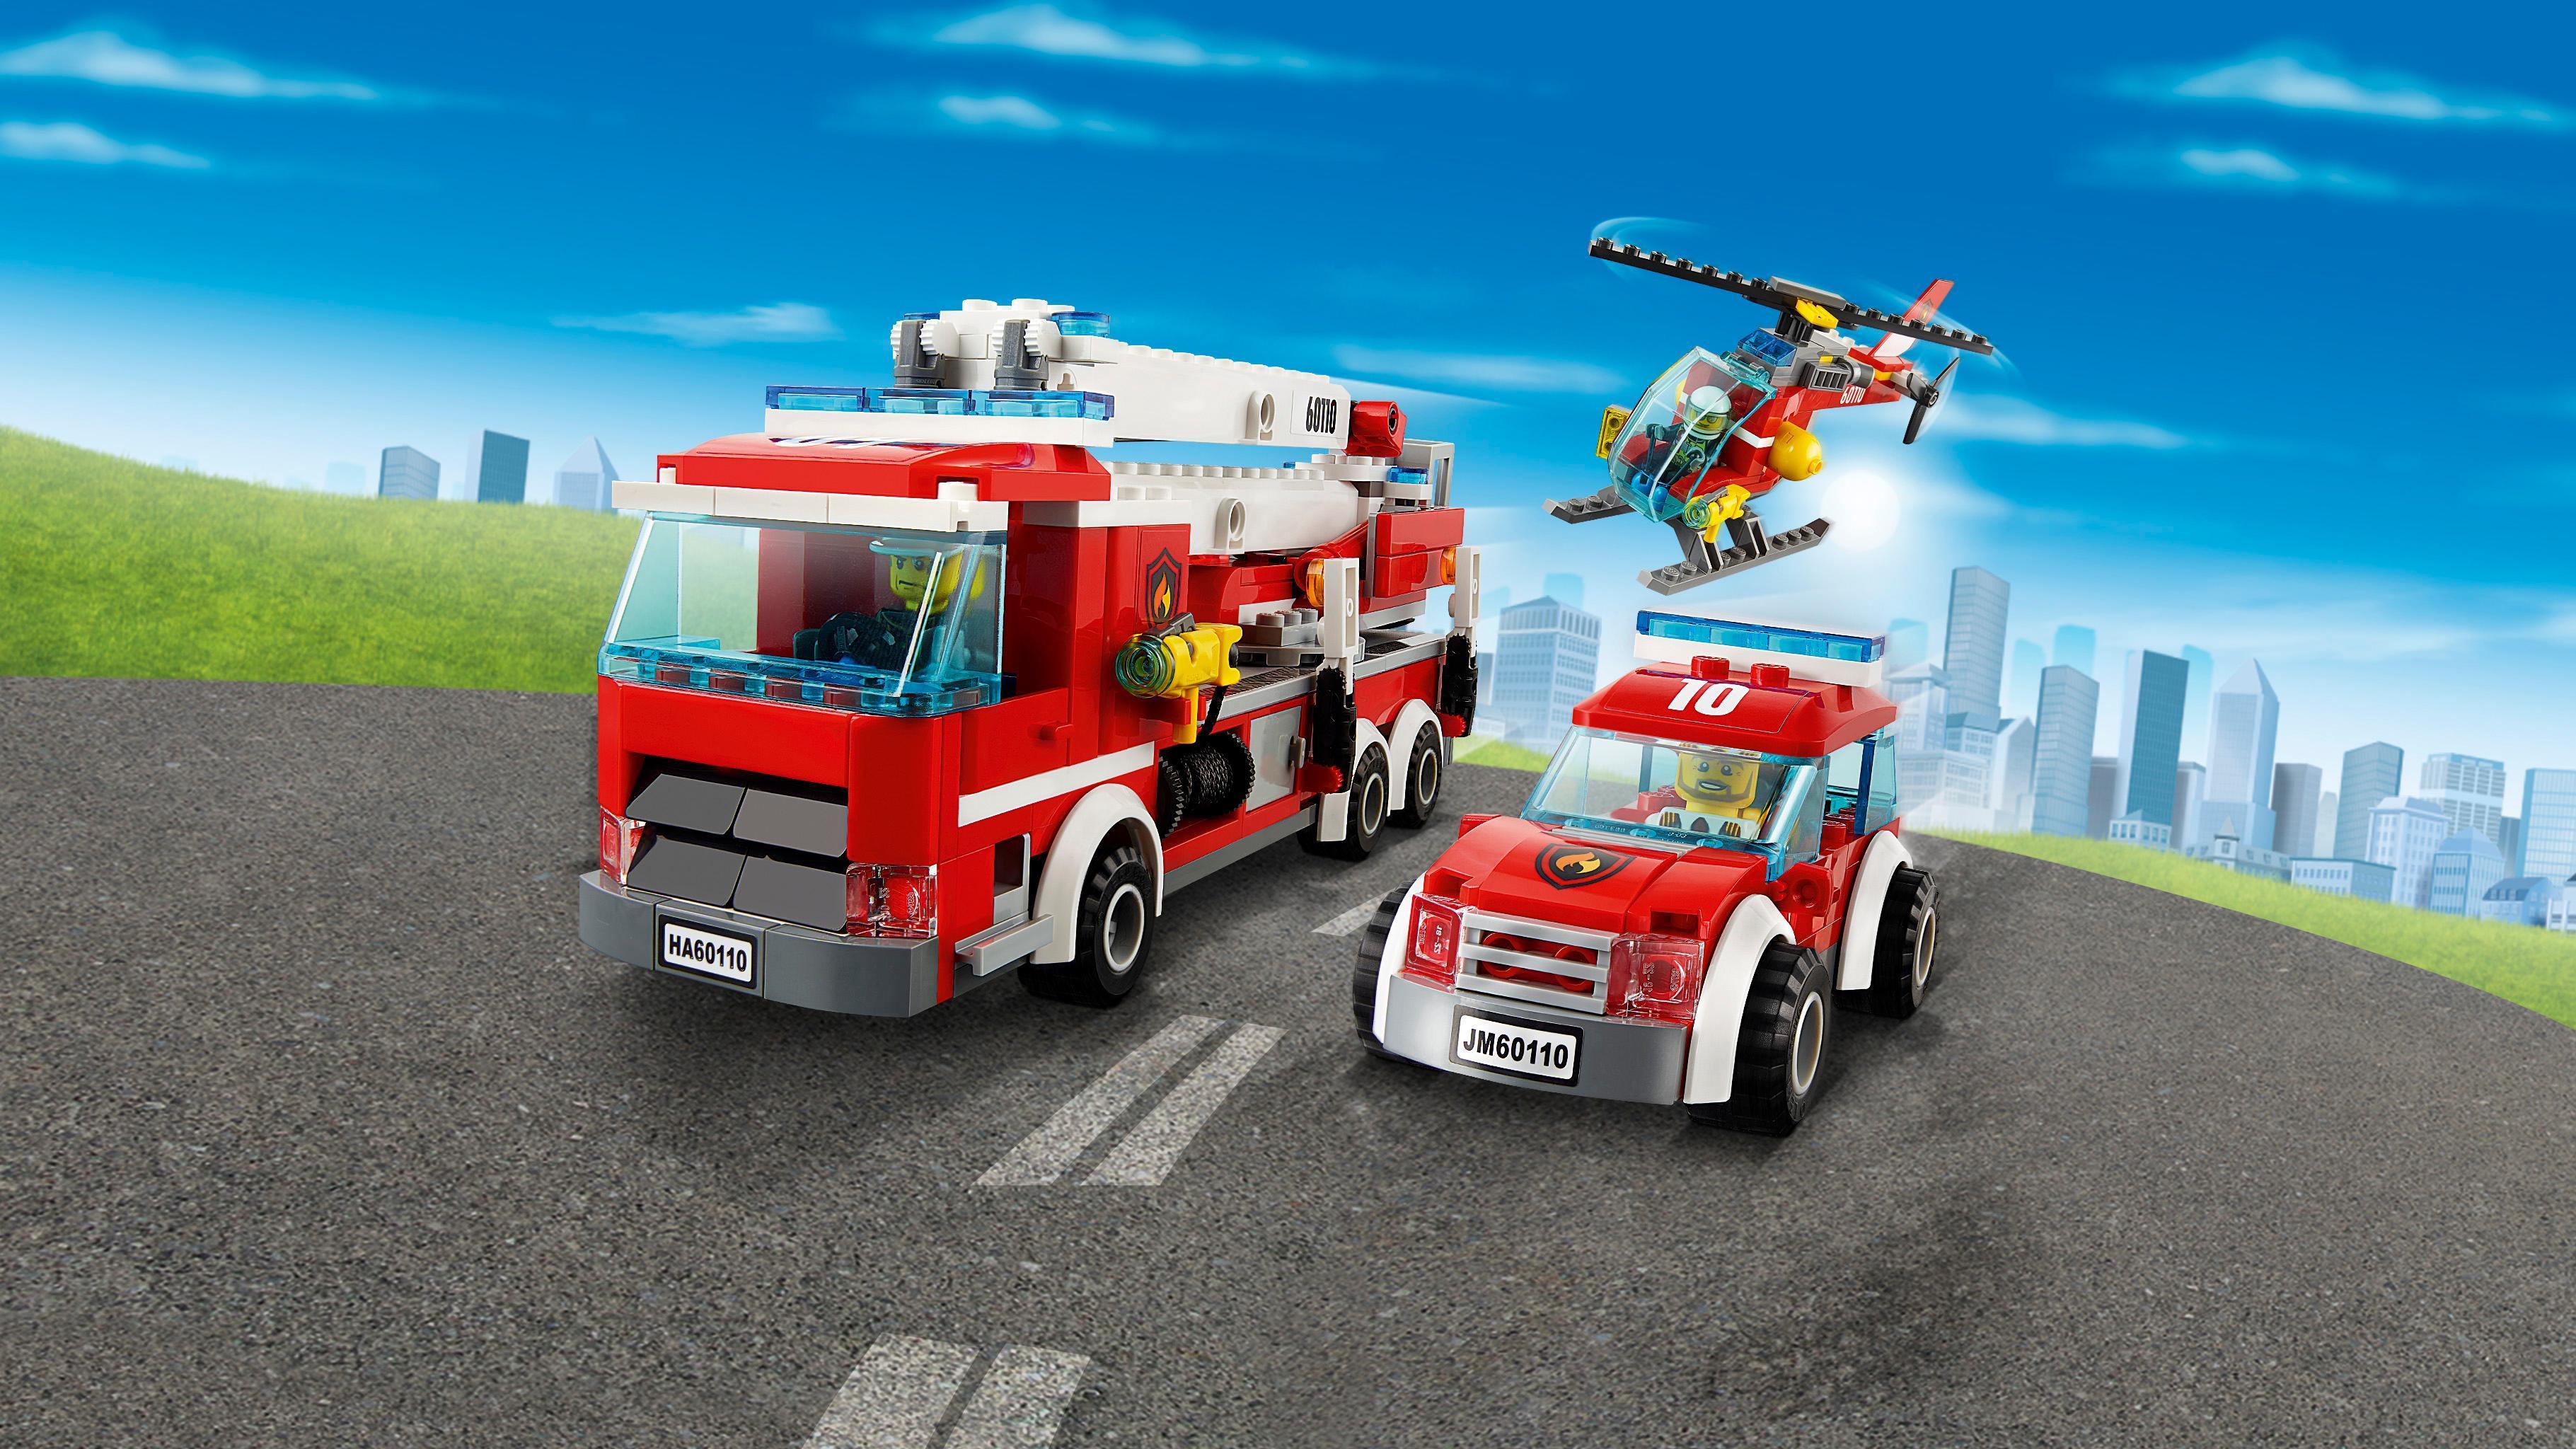 LEGO City Fire 60110: Fire Station Mixed: LEGO: Amazon.co ...